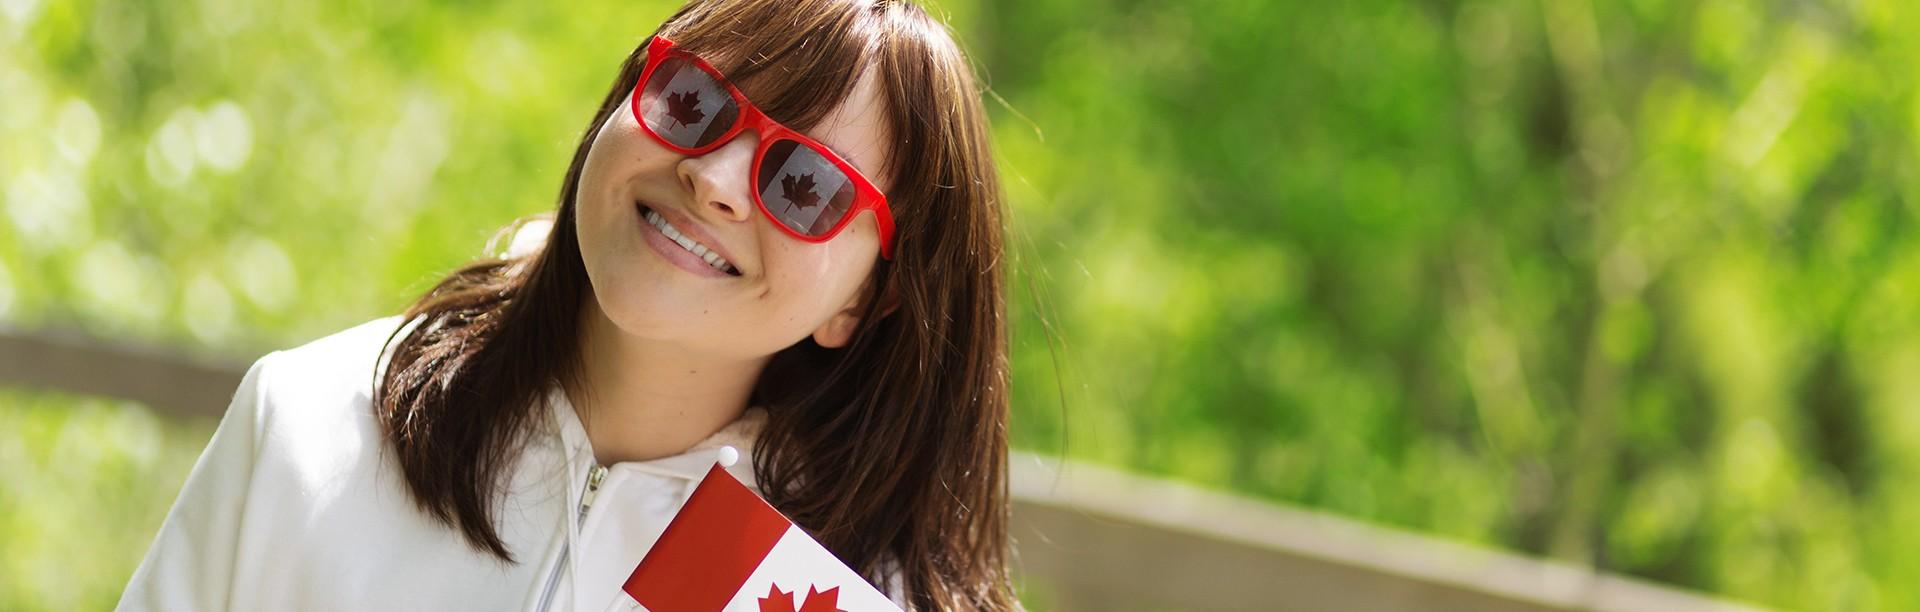 Educatius-EdmontonPublicSchoolDistrict-Canada-GirlwithFlag-Banner